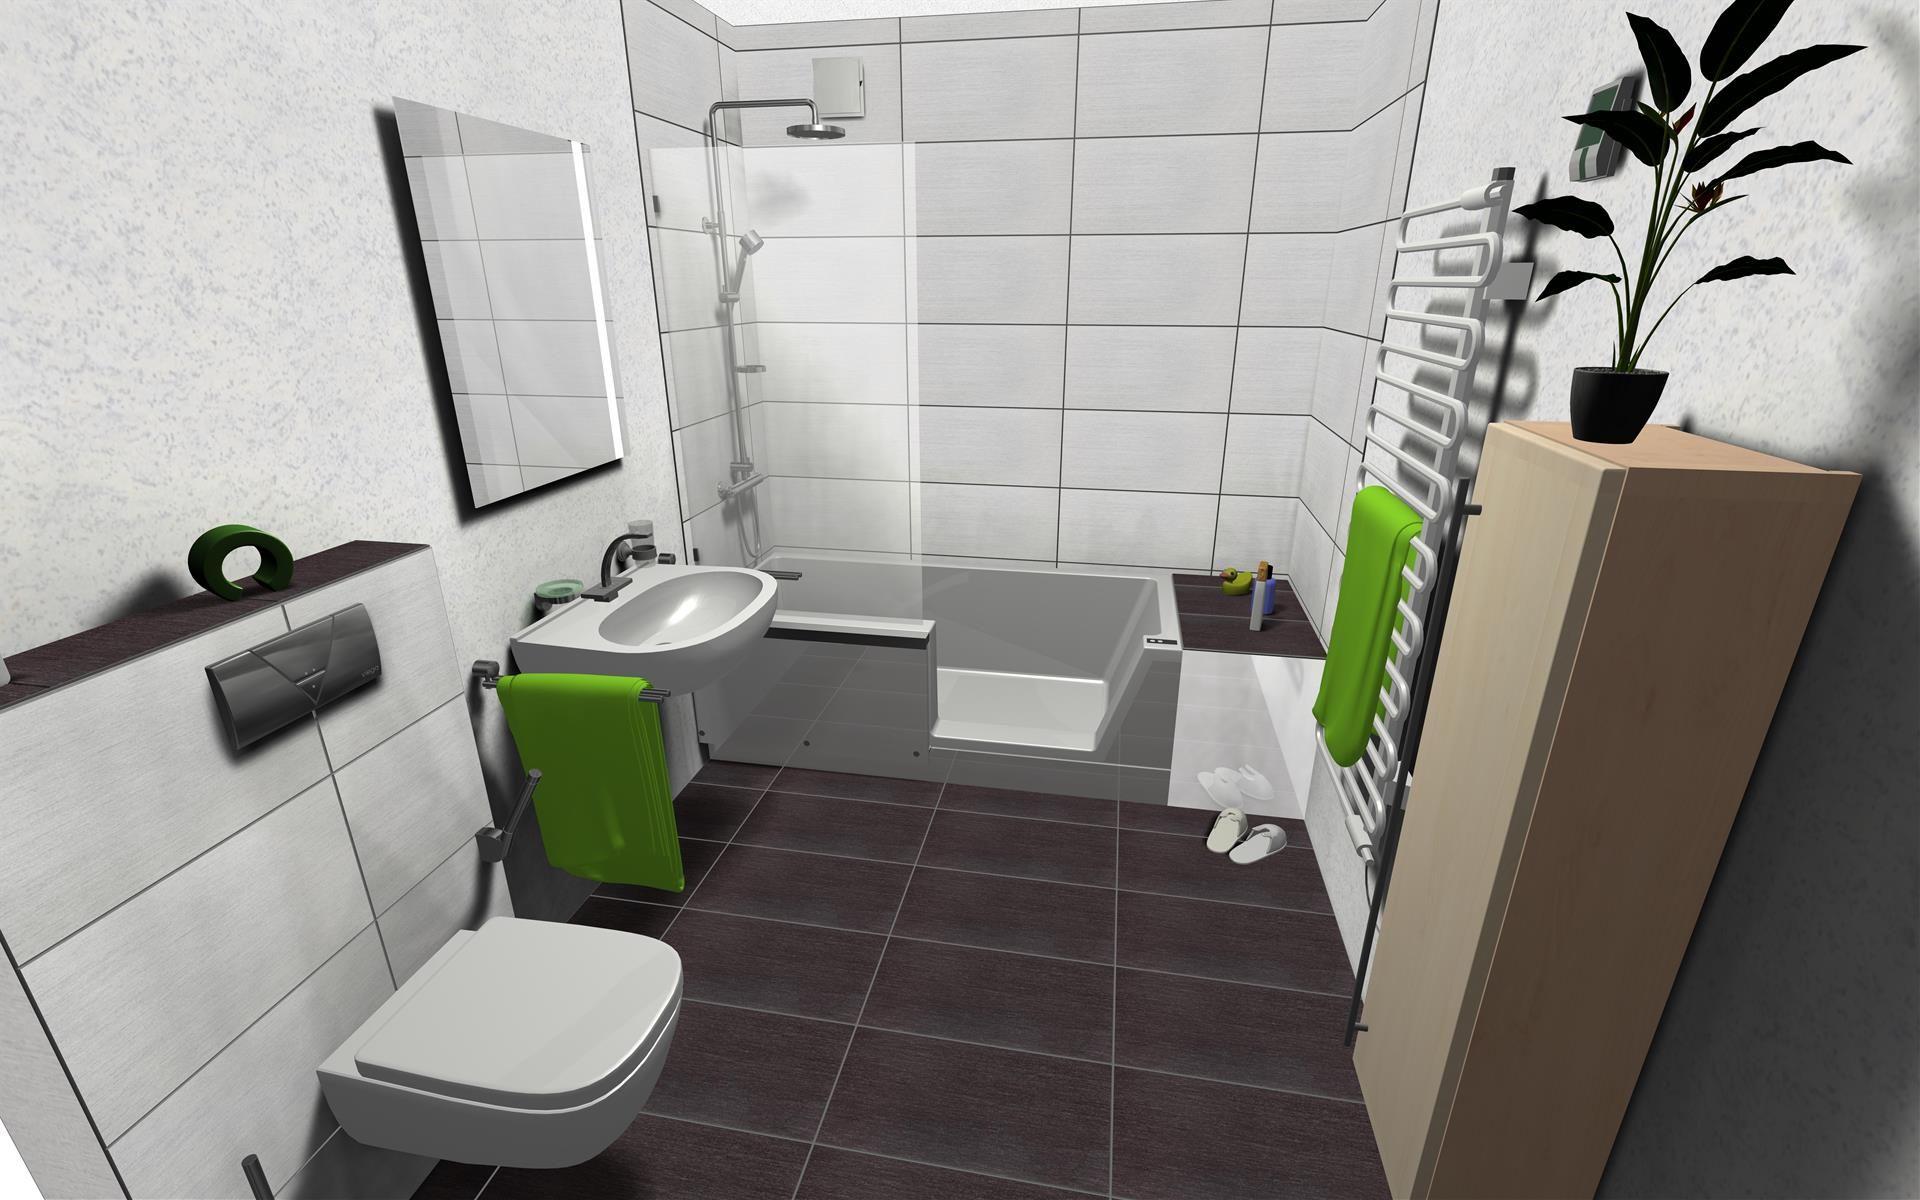 Badezimmer Designer Software Badezimmer Planen Badezimmer Online Planen Badezimmer